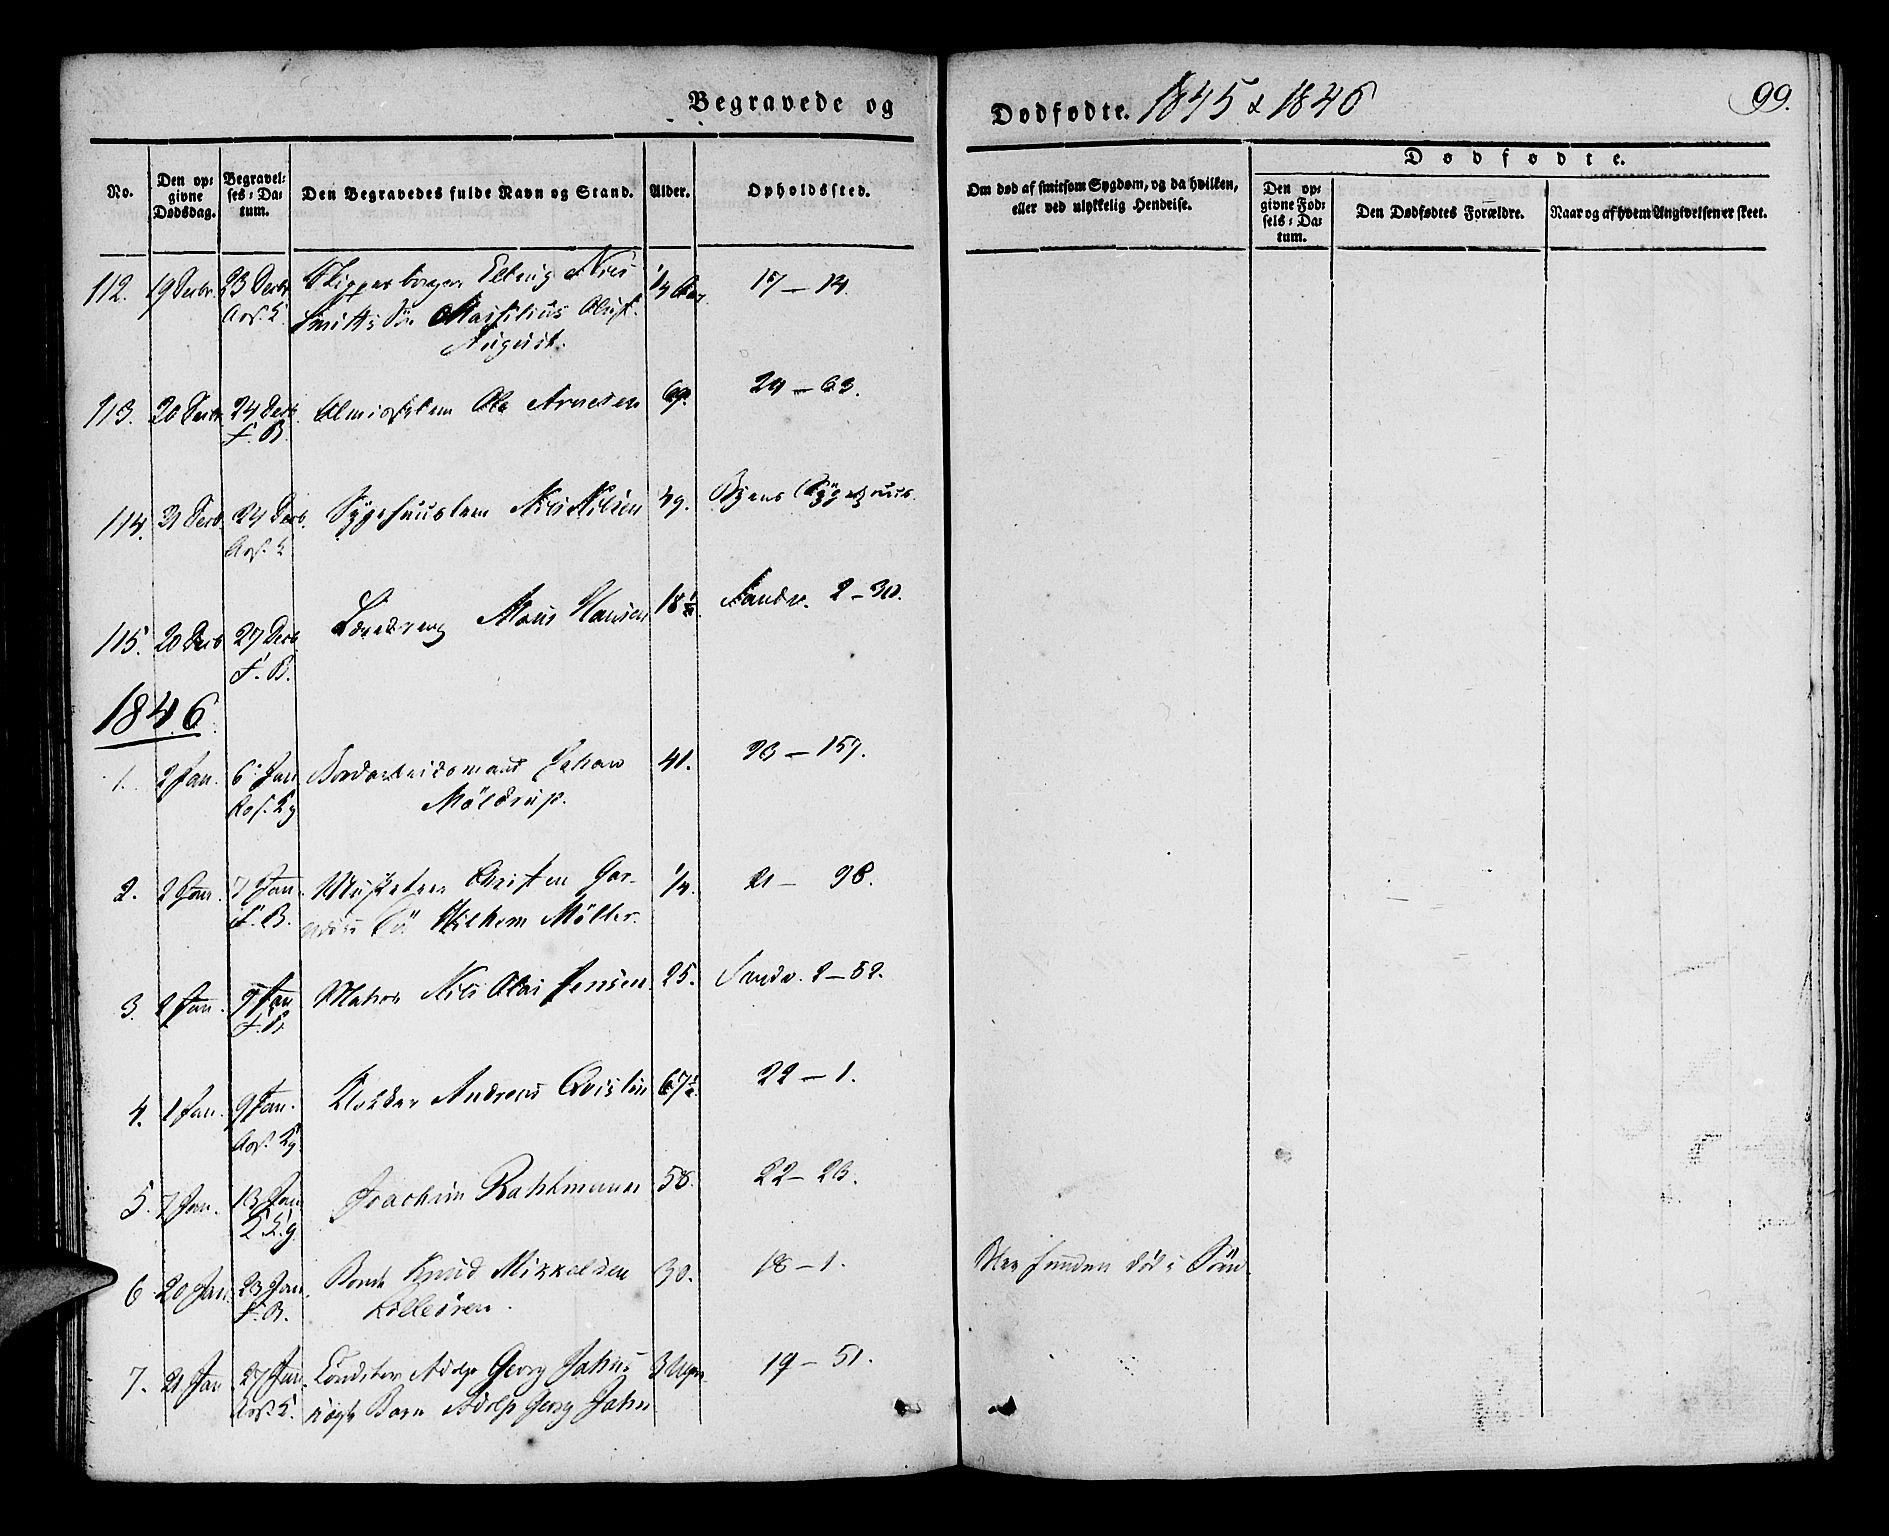 SAB, Korskirken Sokneprestembete, H/Haa/L0043: Ministerialbok nr. E 1, 1834-1848, s. 99